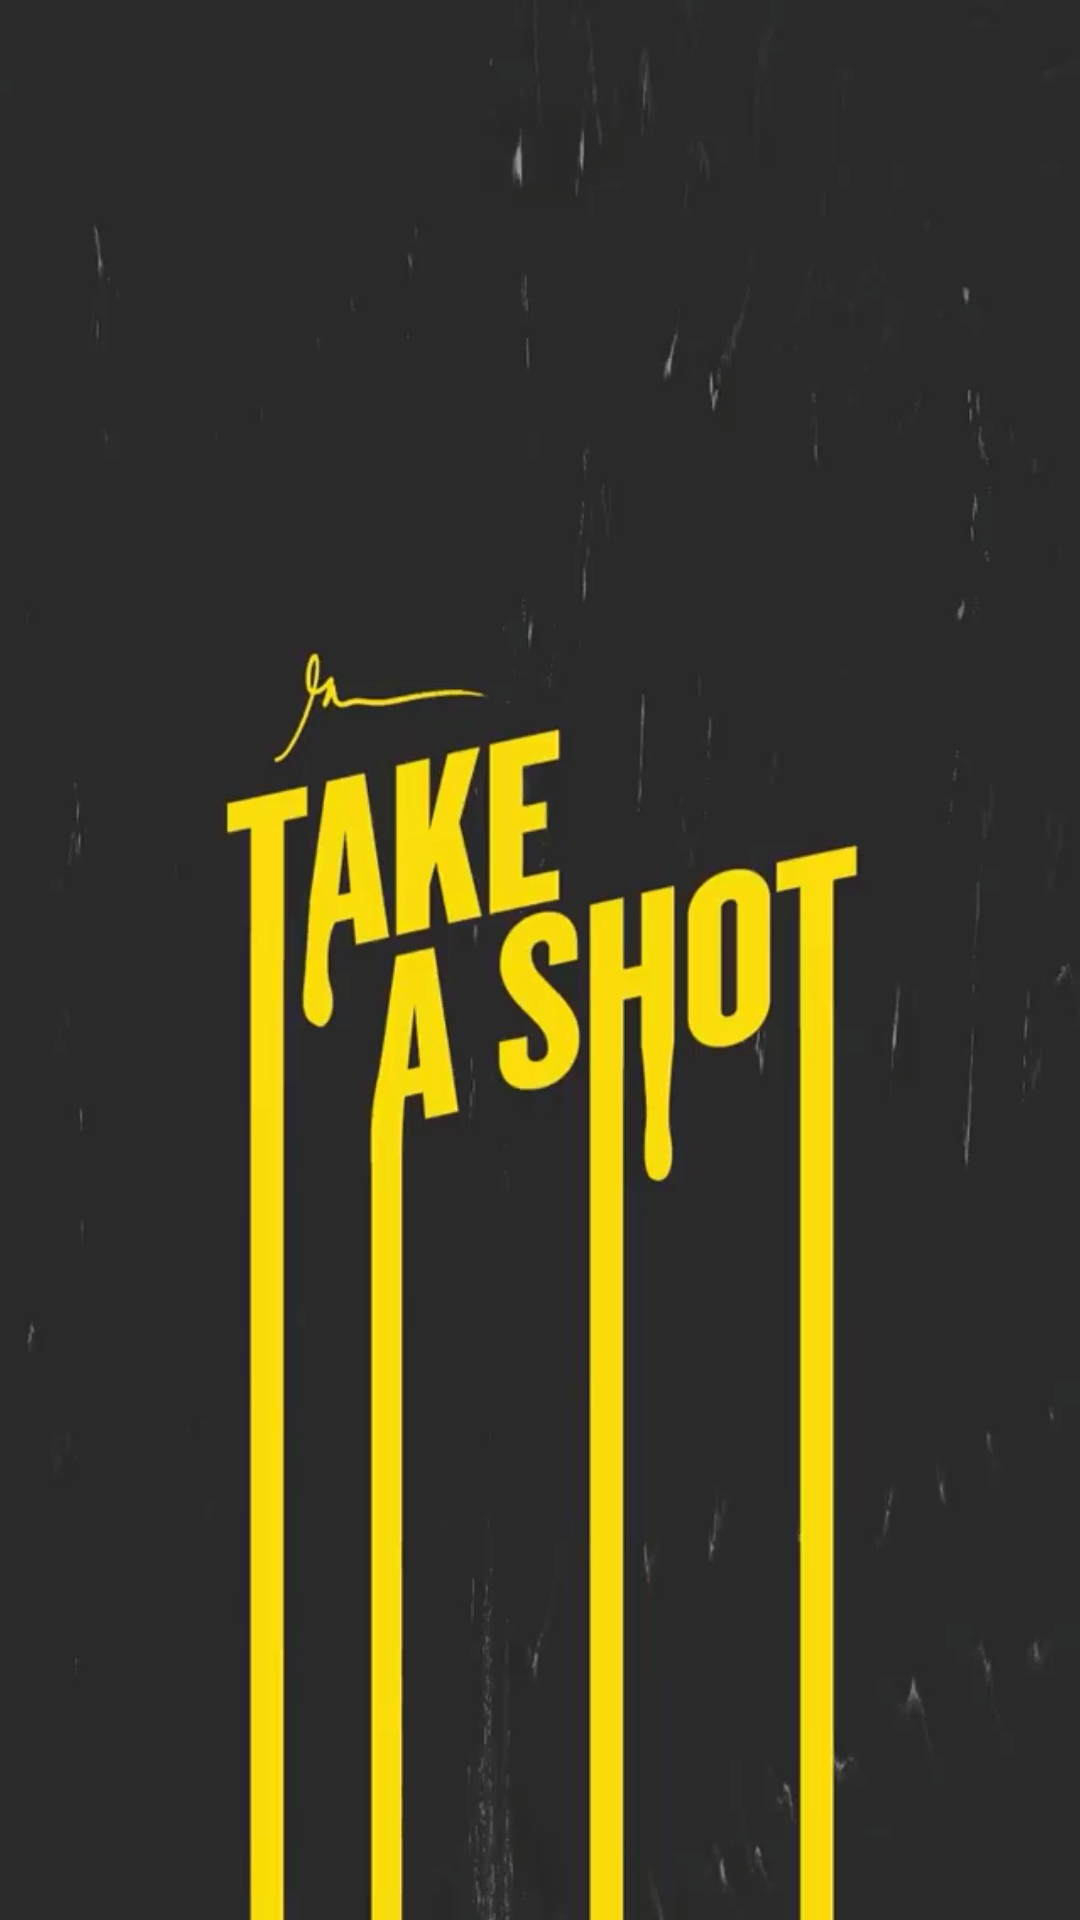 Take A Shot Garyveewallpapers.com